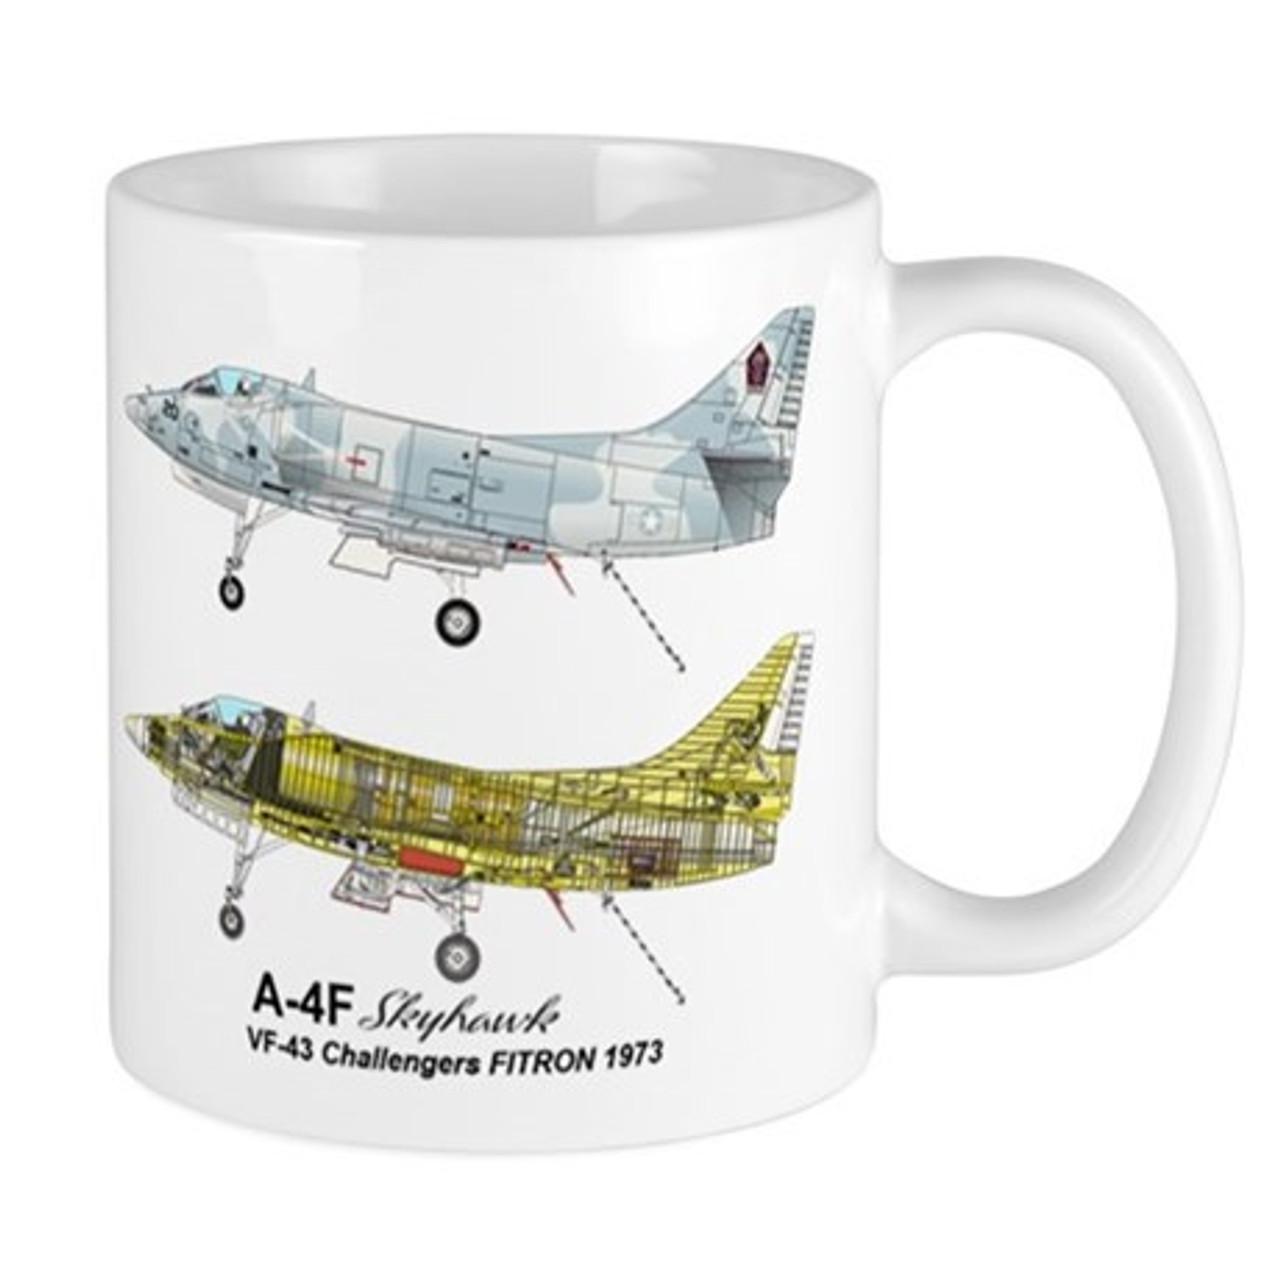 VF-43 Challengers A-4F Skyhawk Mug